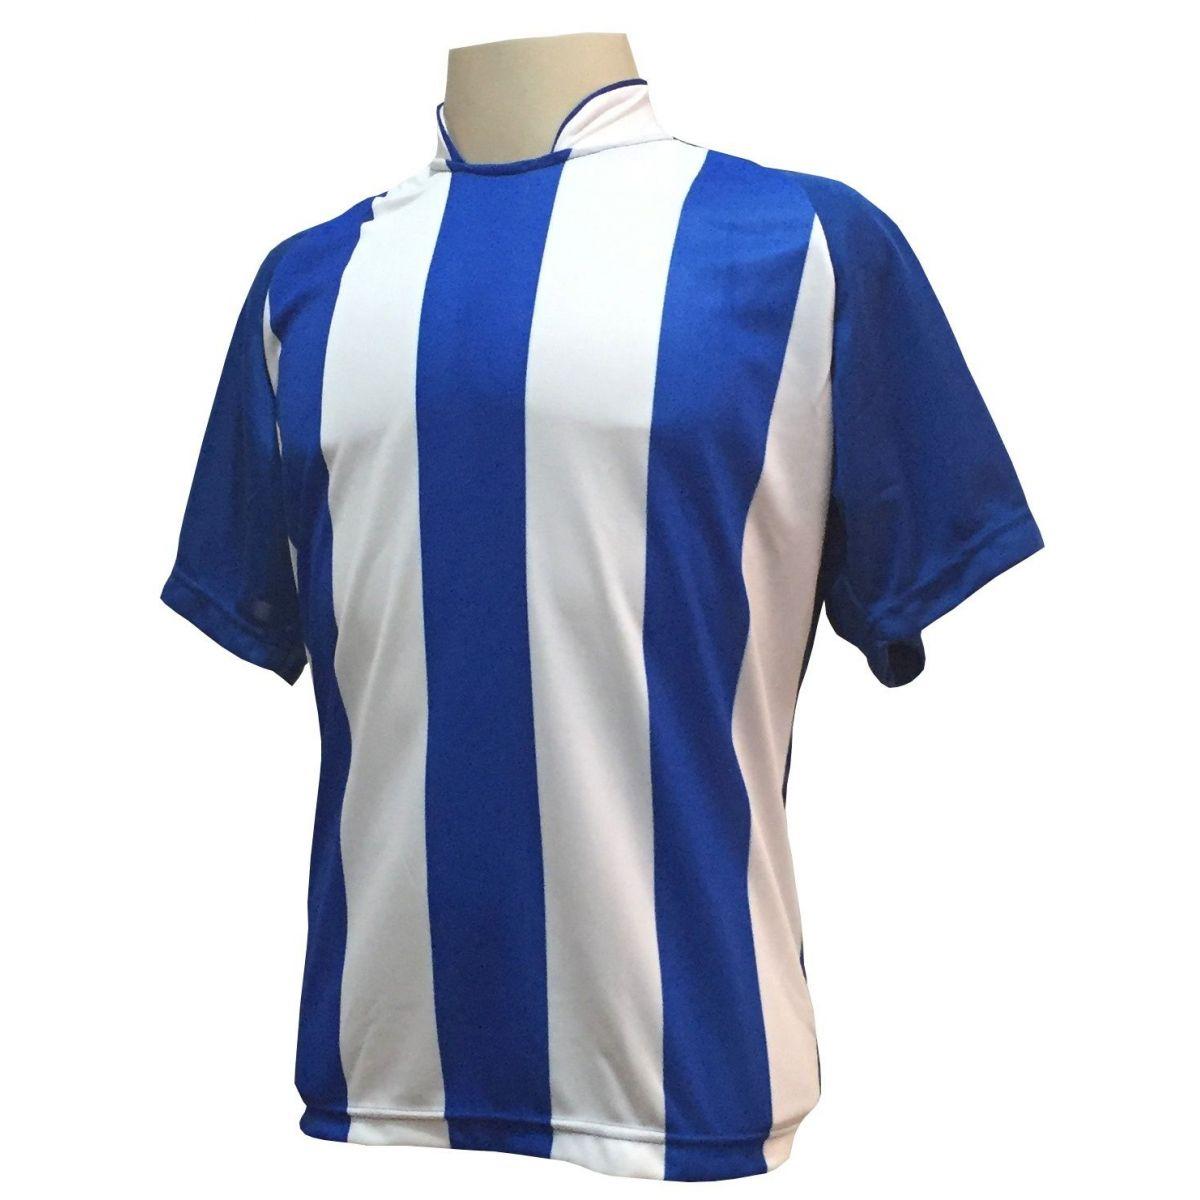 Jogo de Camisa com 12 unidades modelo Milan Royal/Branco